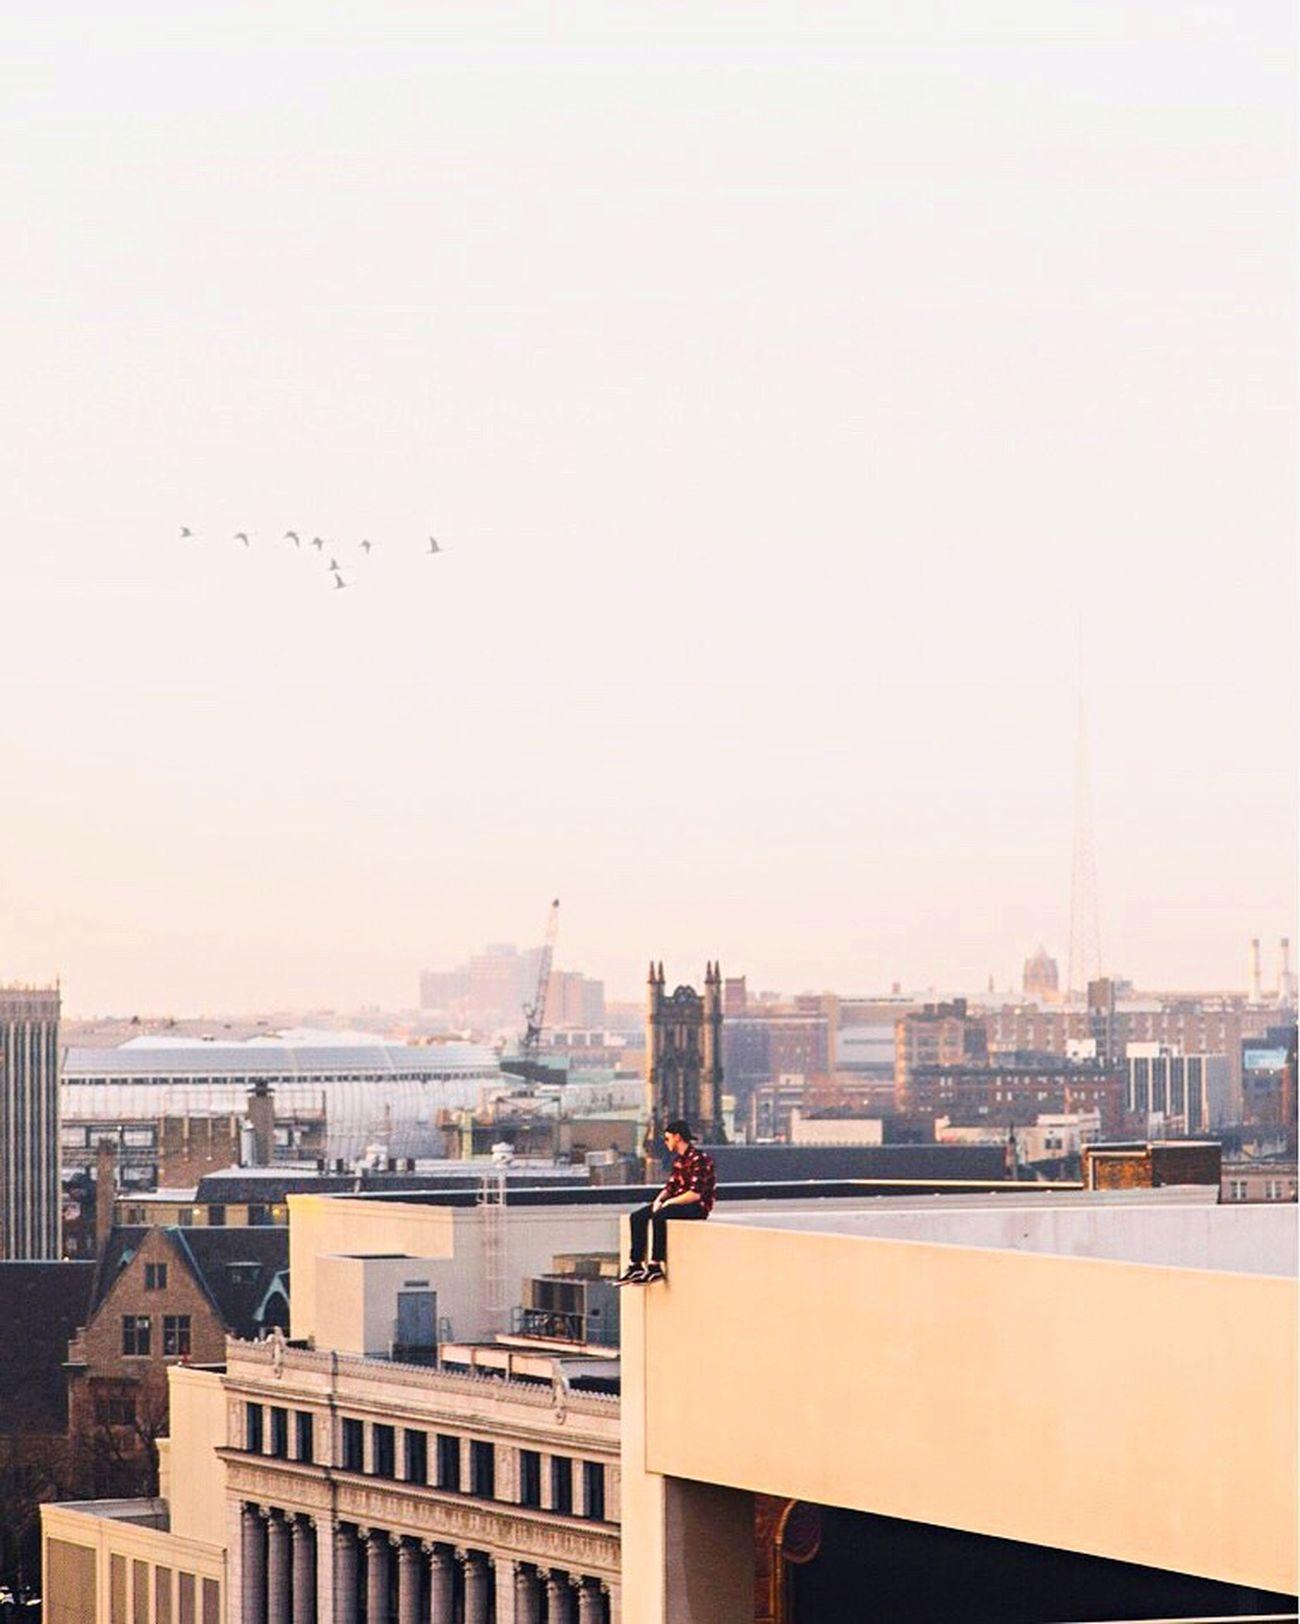 The City Light City Sky & Cityscapes. City Architecture Sunrise Morning Morning Light Skyline Roof Rooftop Sky